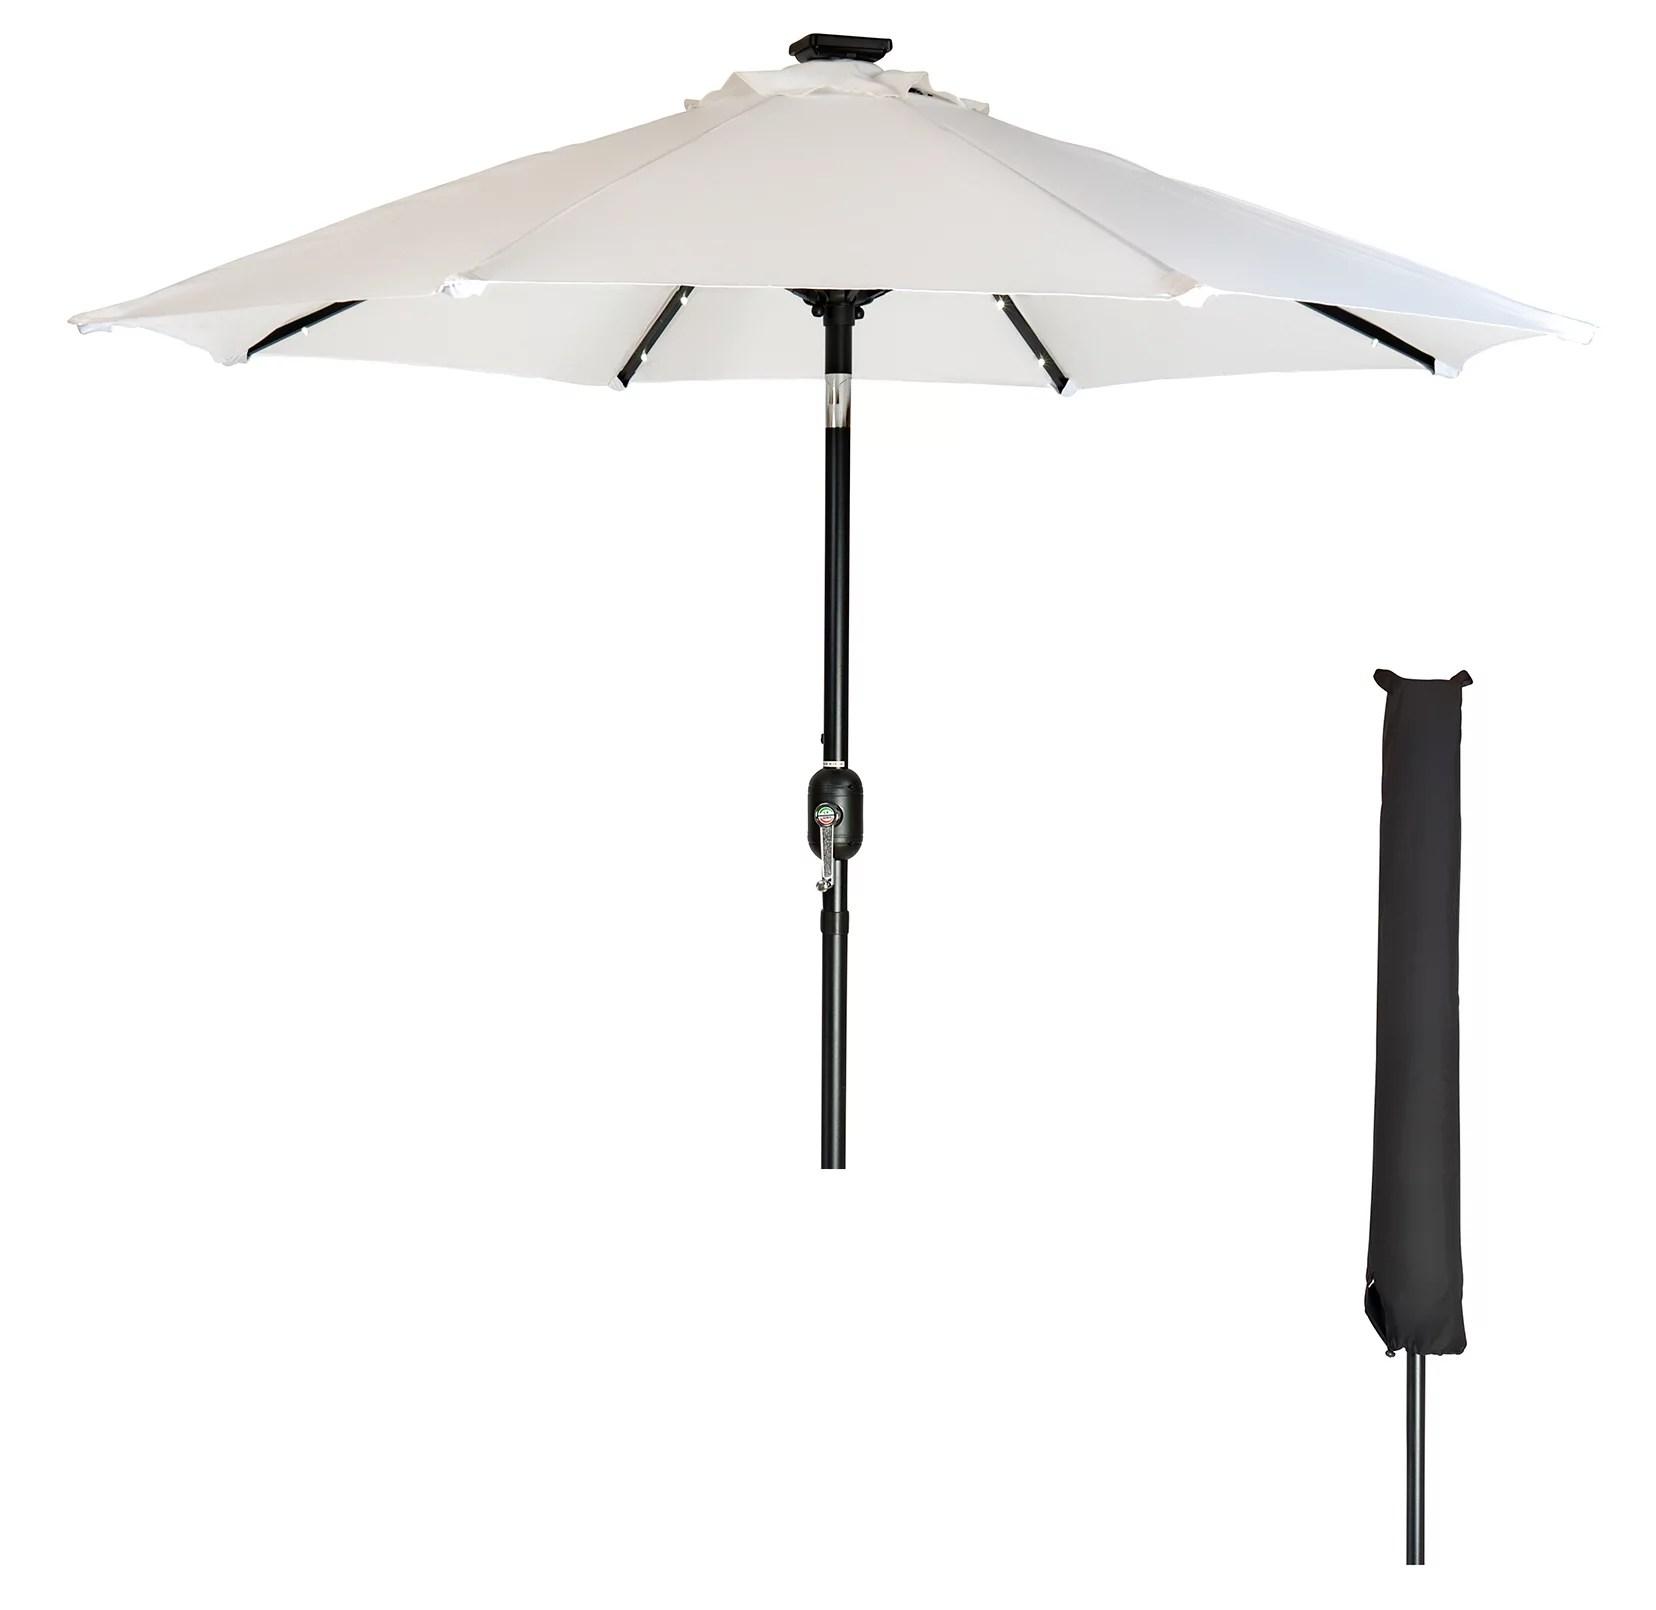 9 solar led patio umbrella with black umbrella cover by trademark innovations white